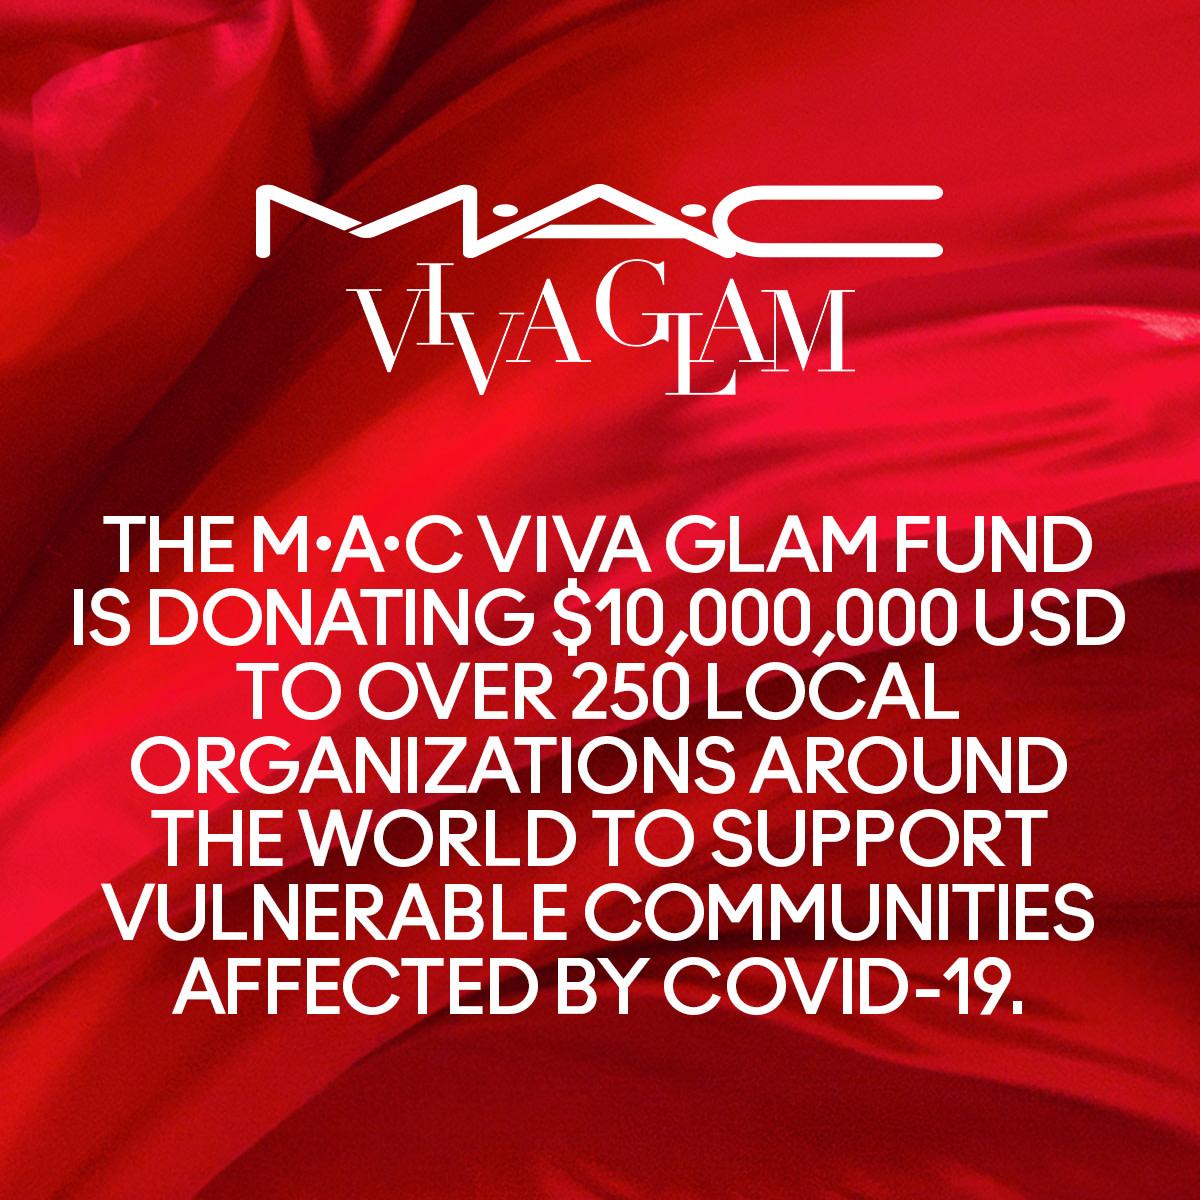 Mac Viva Glam Covid-19 Relief Fund Announcement